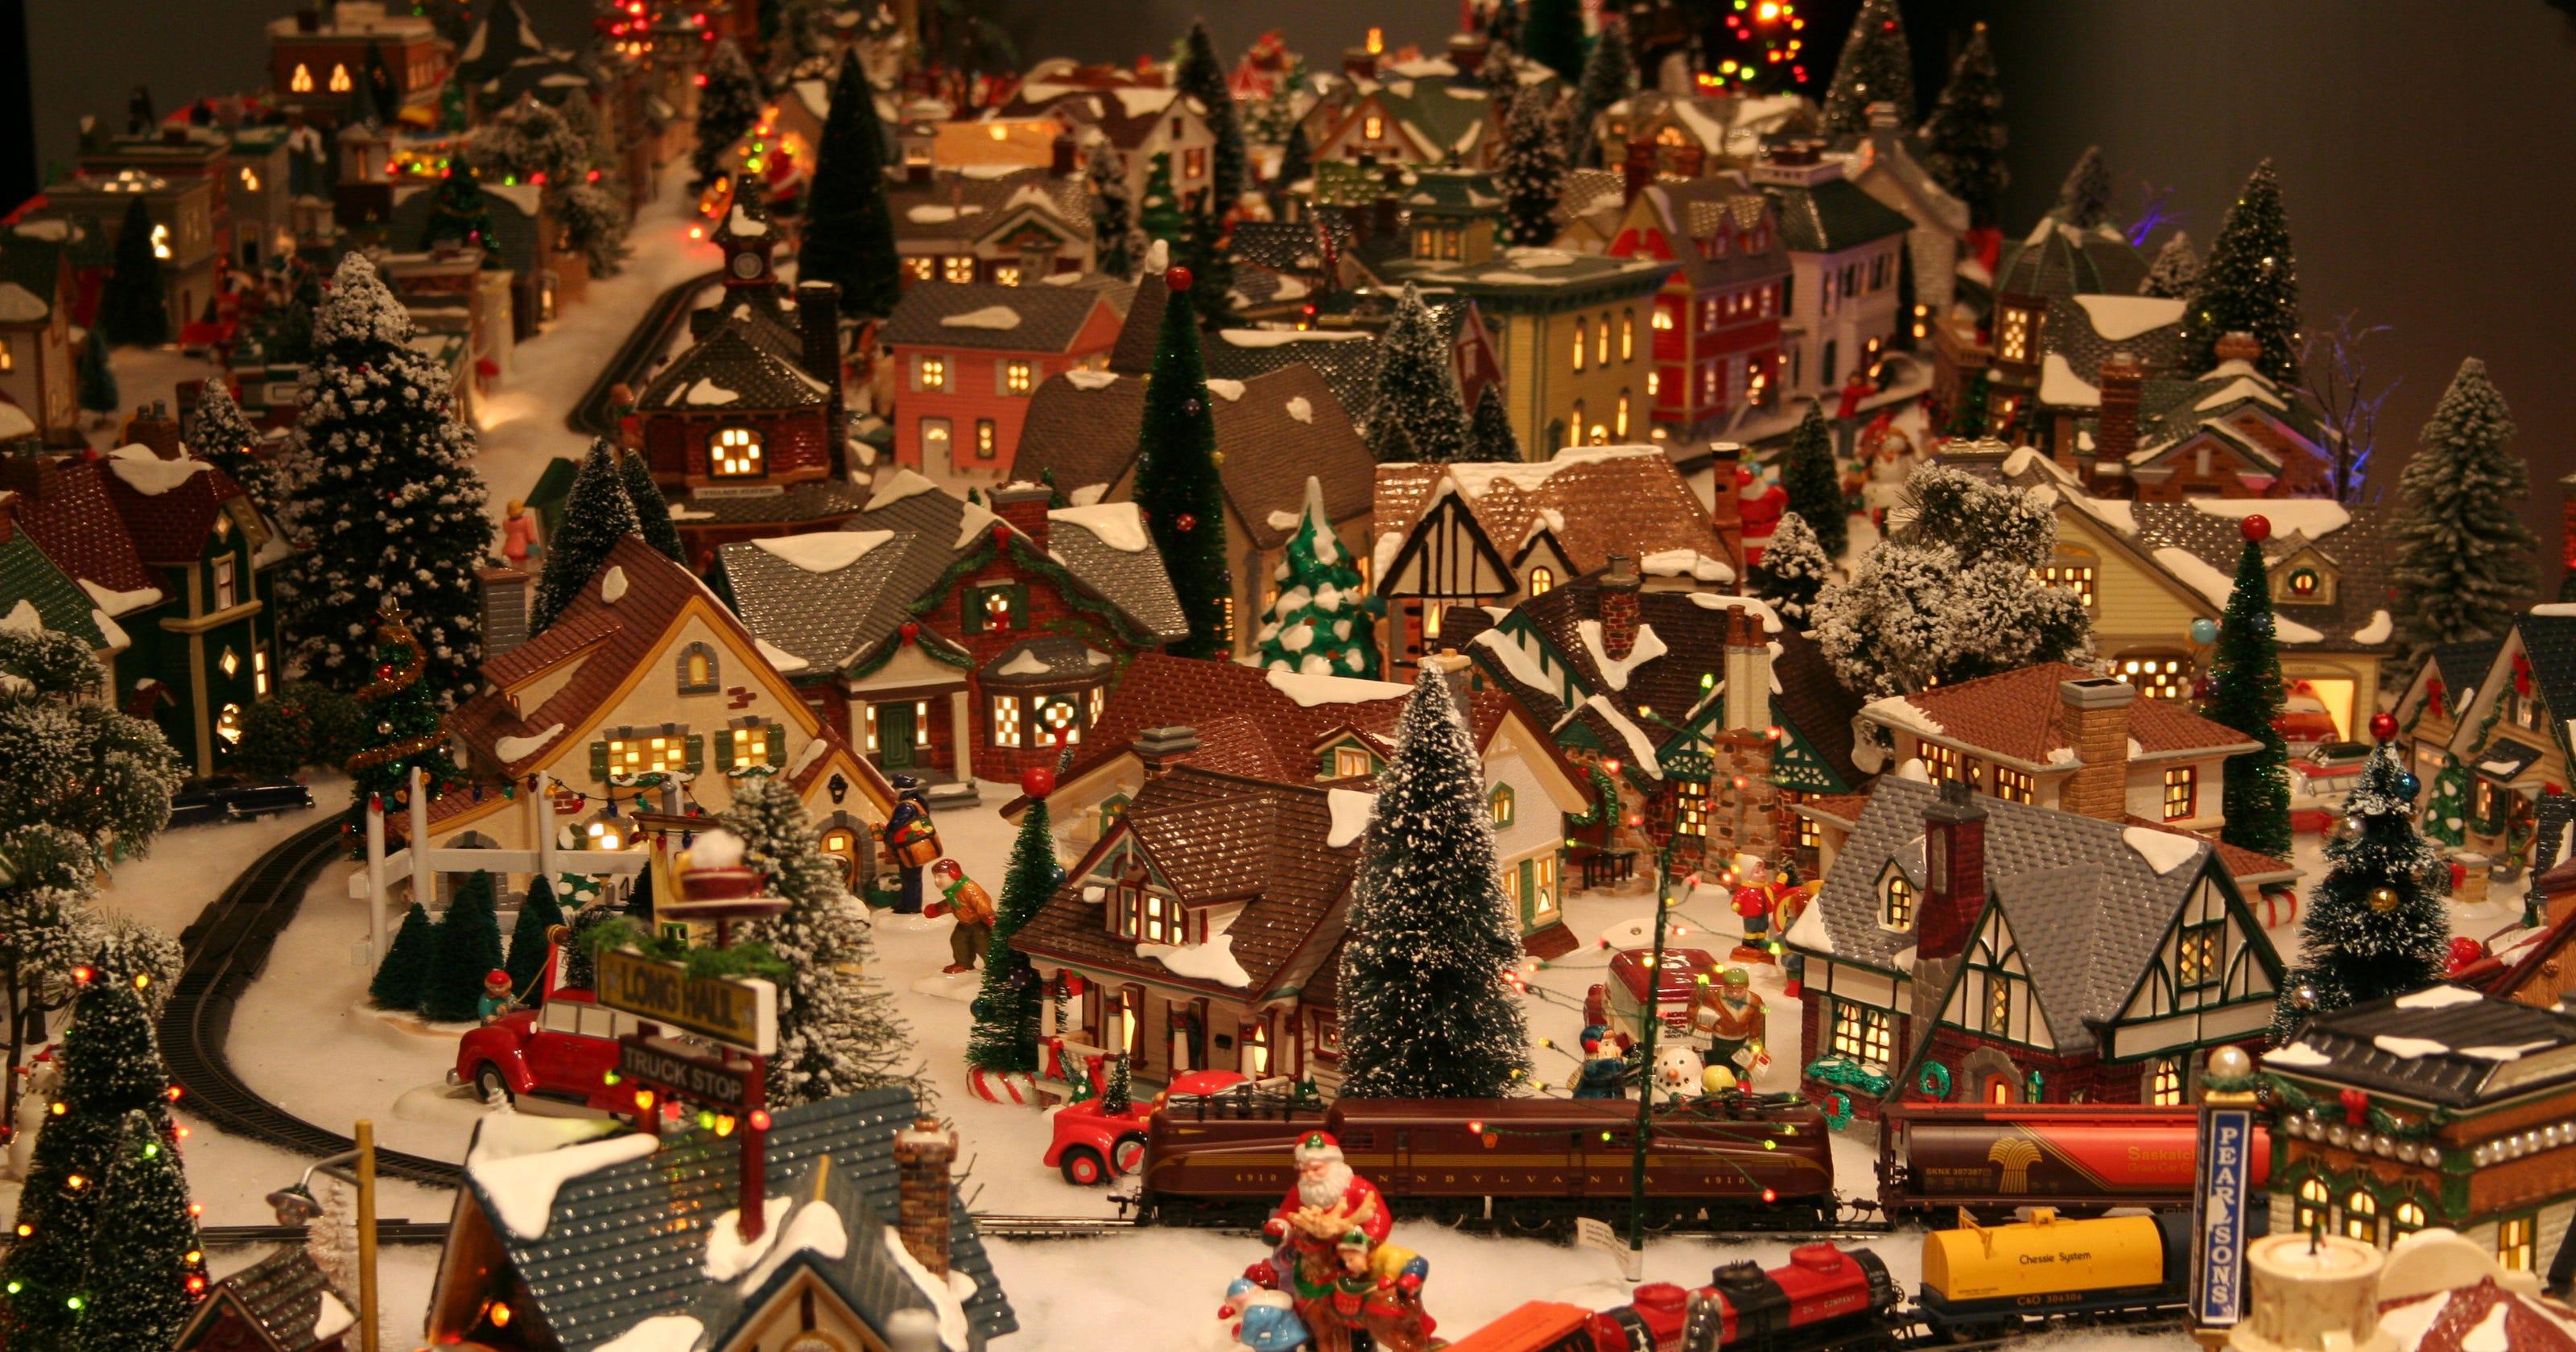 Miniature Christmas Village.Monroe Man Creates 200 Building Mini Christmas Village